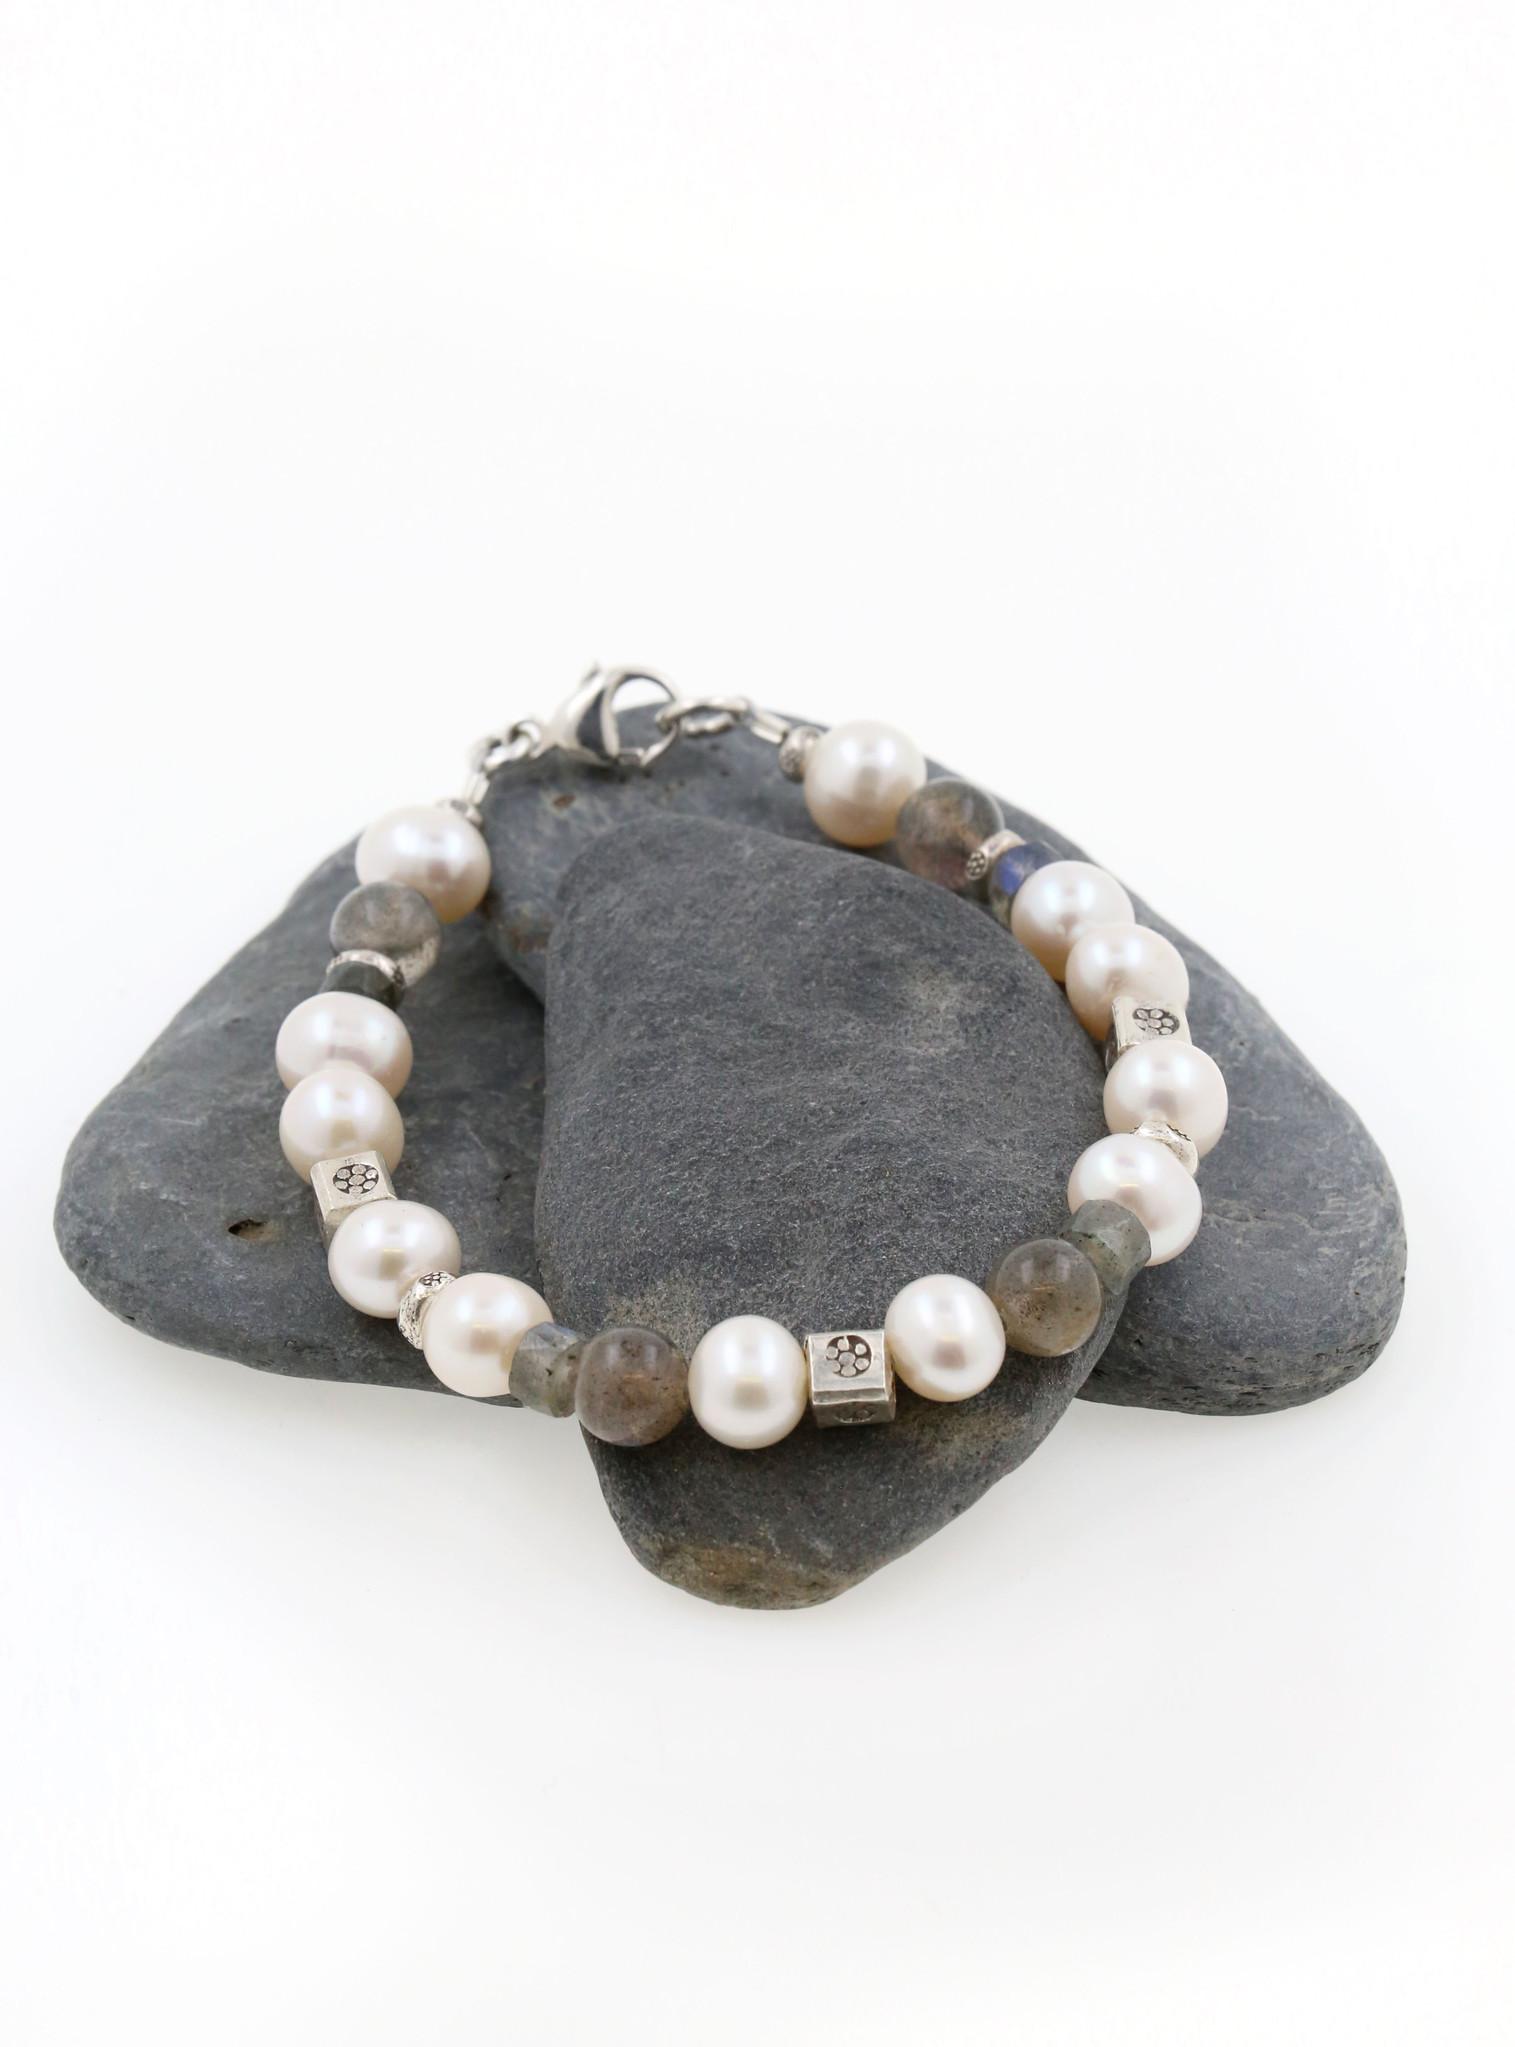 Armband Labradorit, SW-Perle, Silberelemente, groß